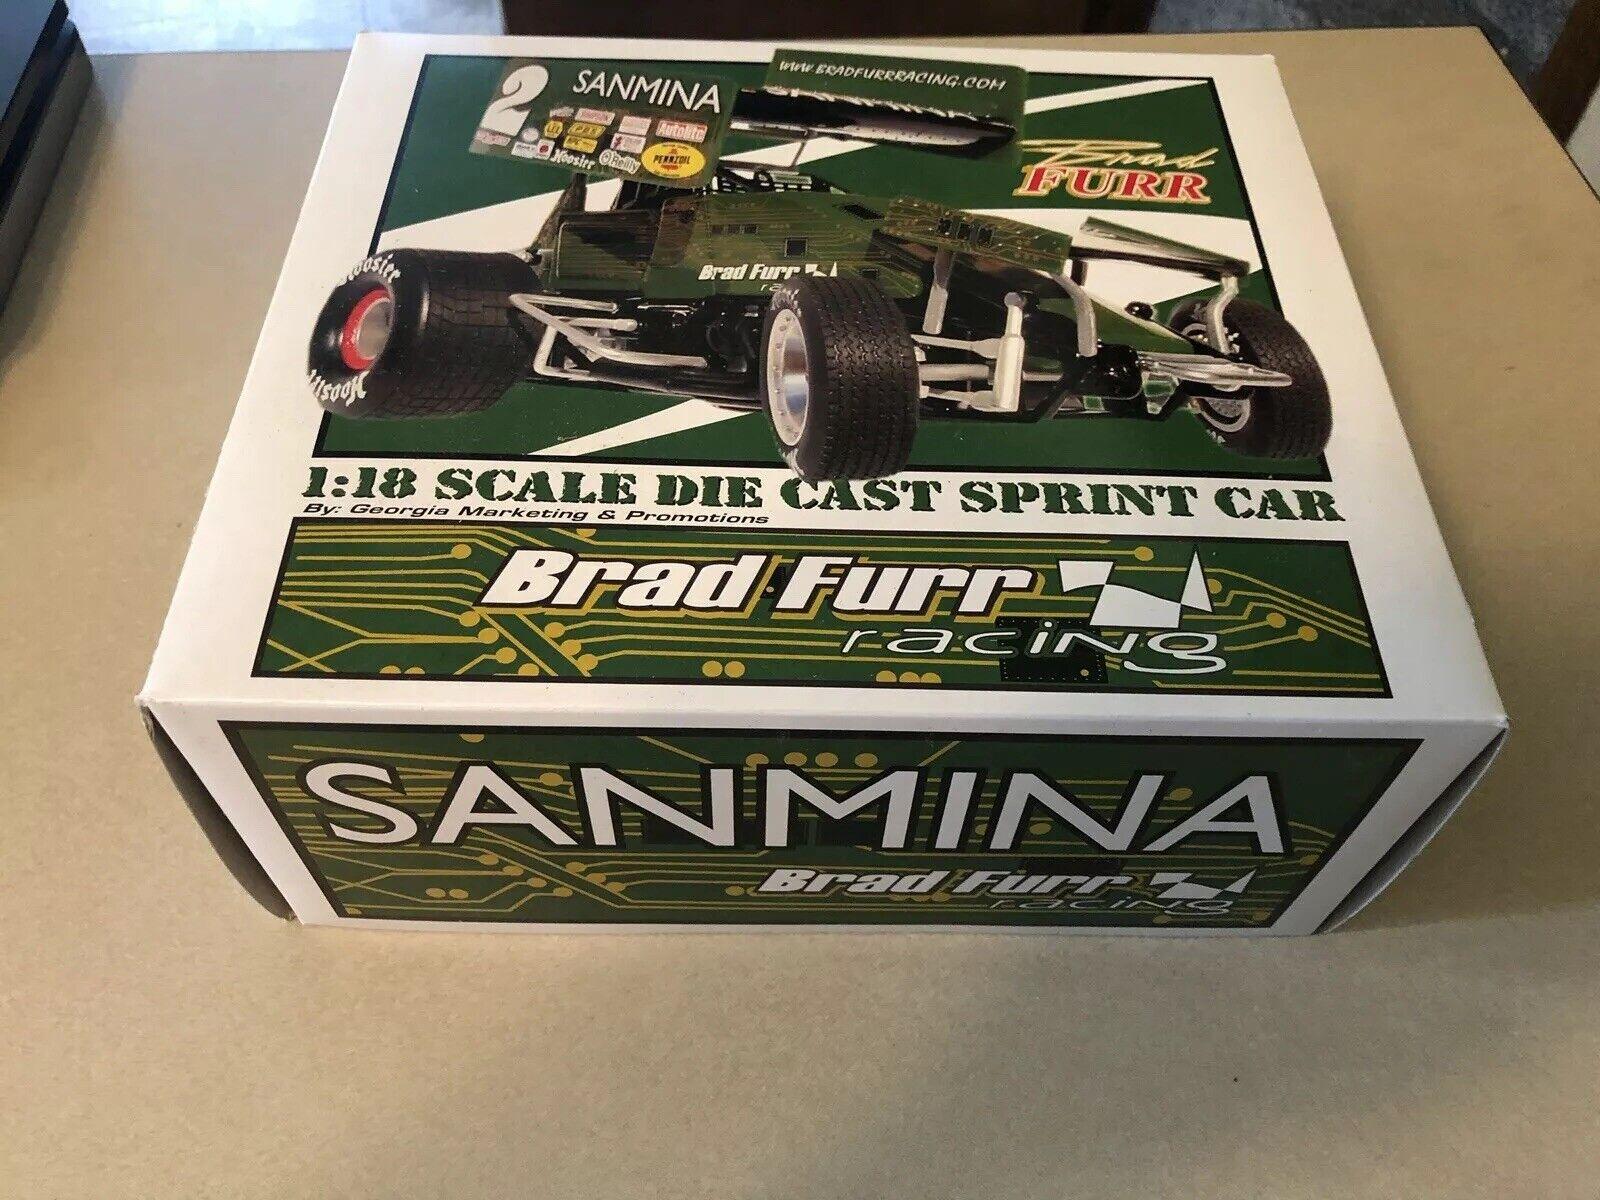 GMP Sanmina Brad Furr 1 18 Scale Die Cast Sprint Car